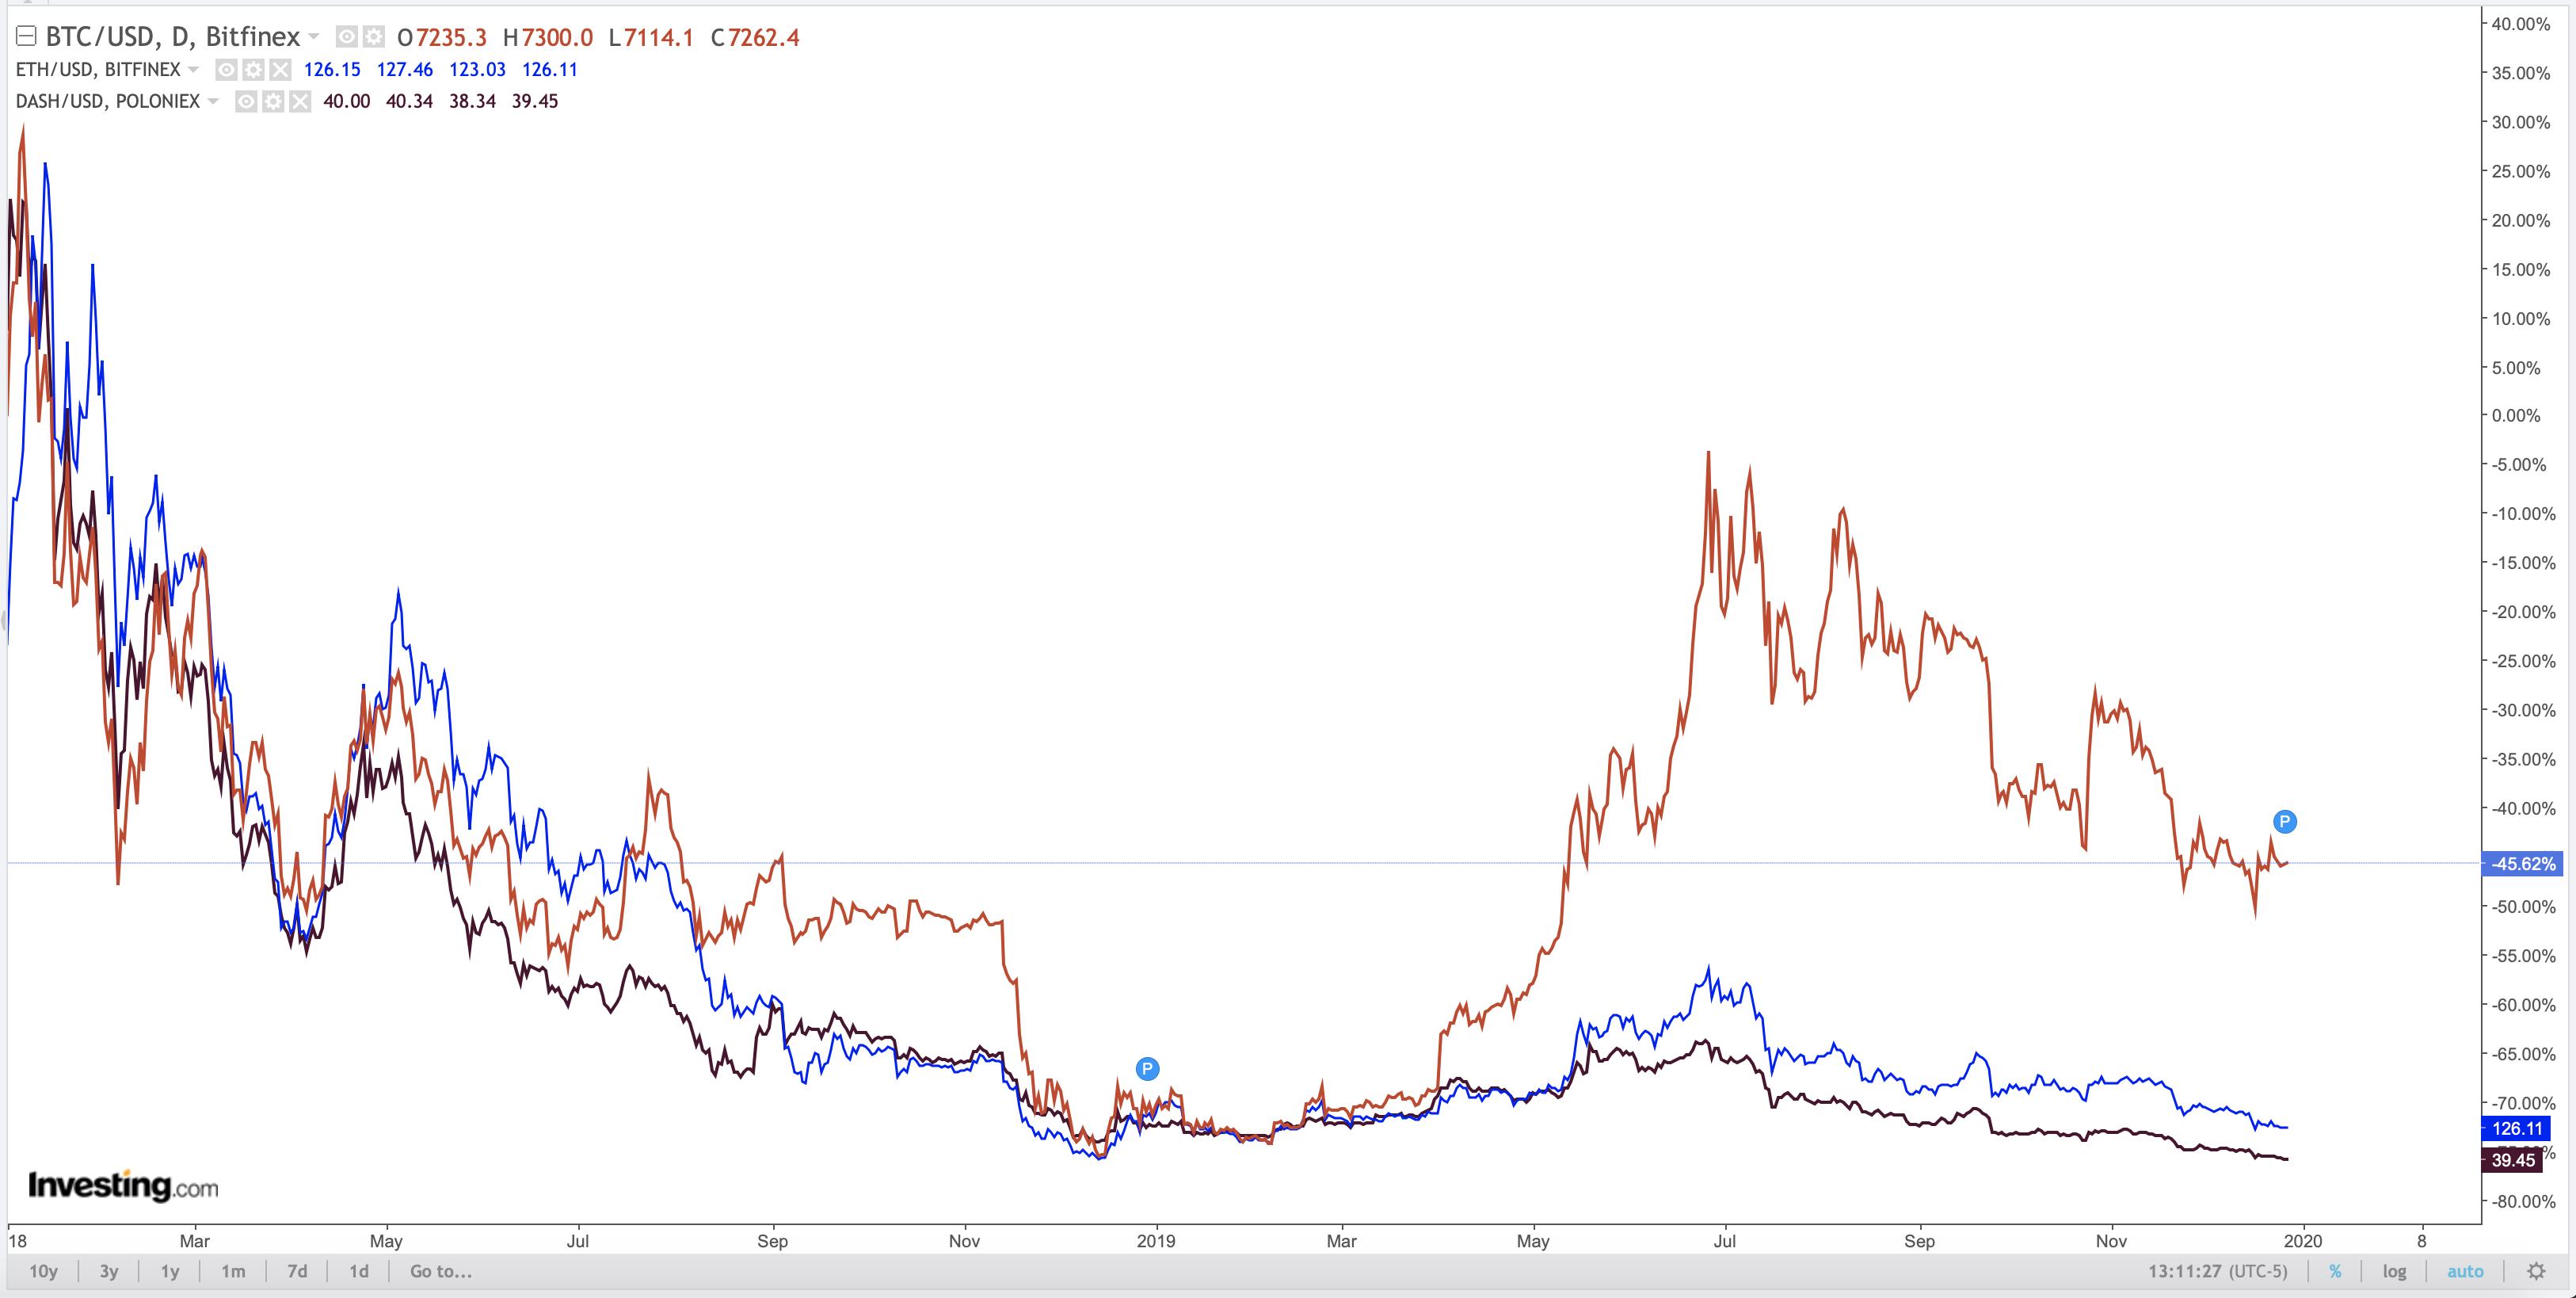 Grafico Bitcoin 2